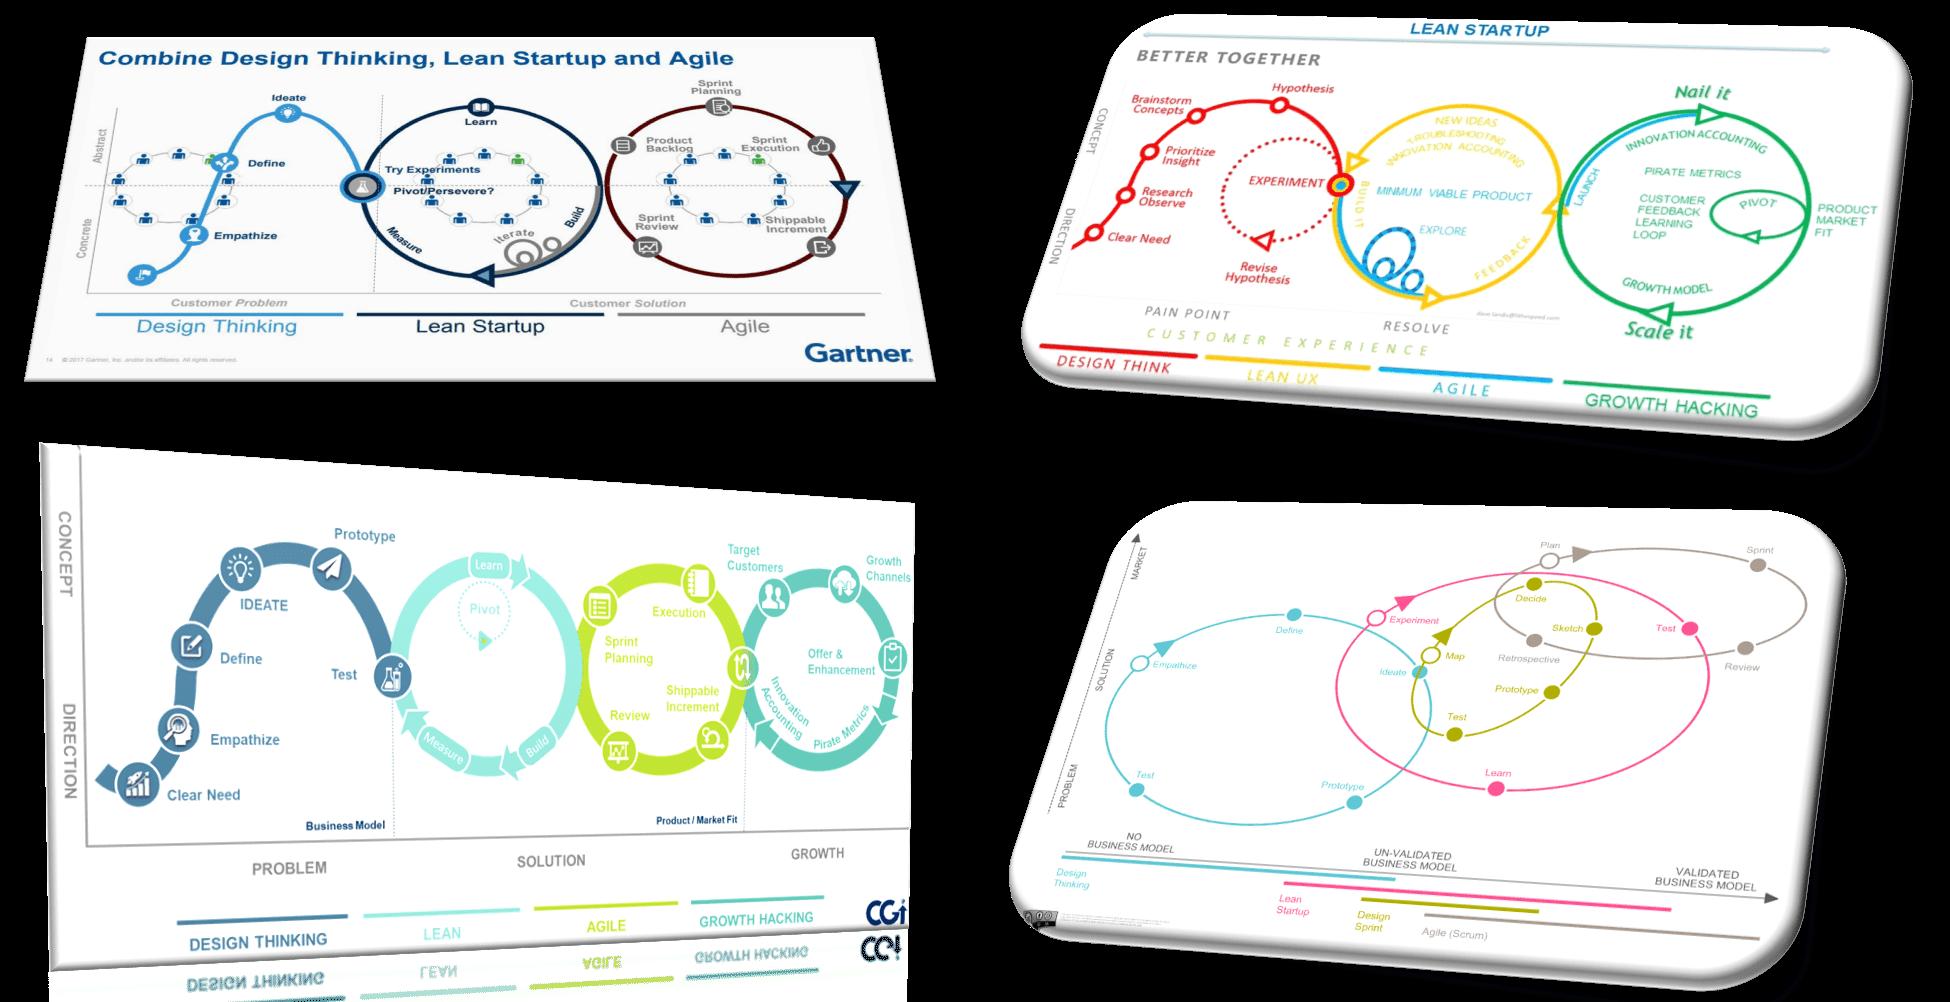 design-thinking-lean-agile-growth-hacking